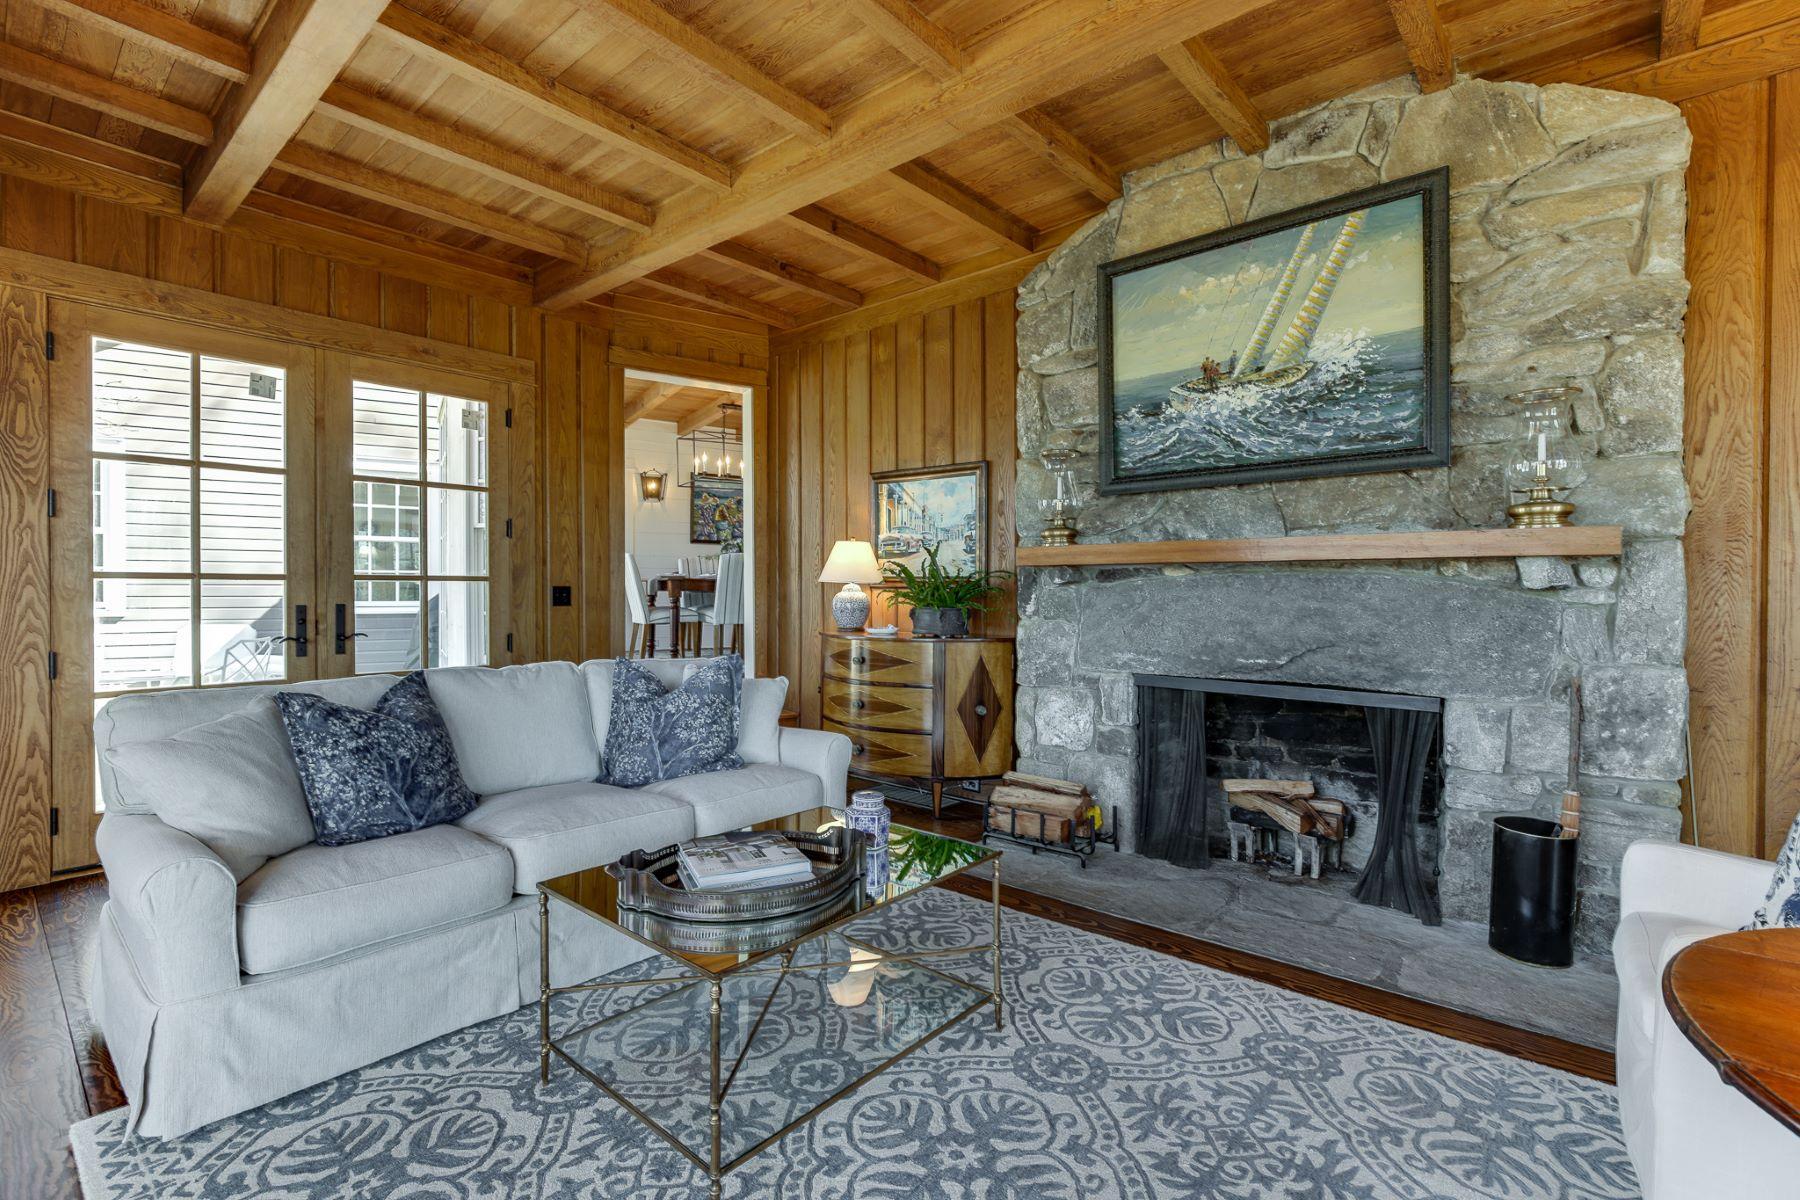 Single Family Homes for Sale at 525 Satulah Road Highlands, North Carolina 28741 United States